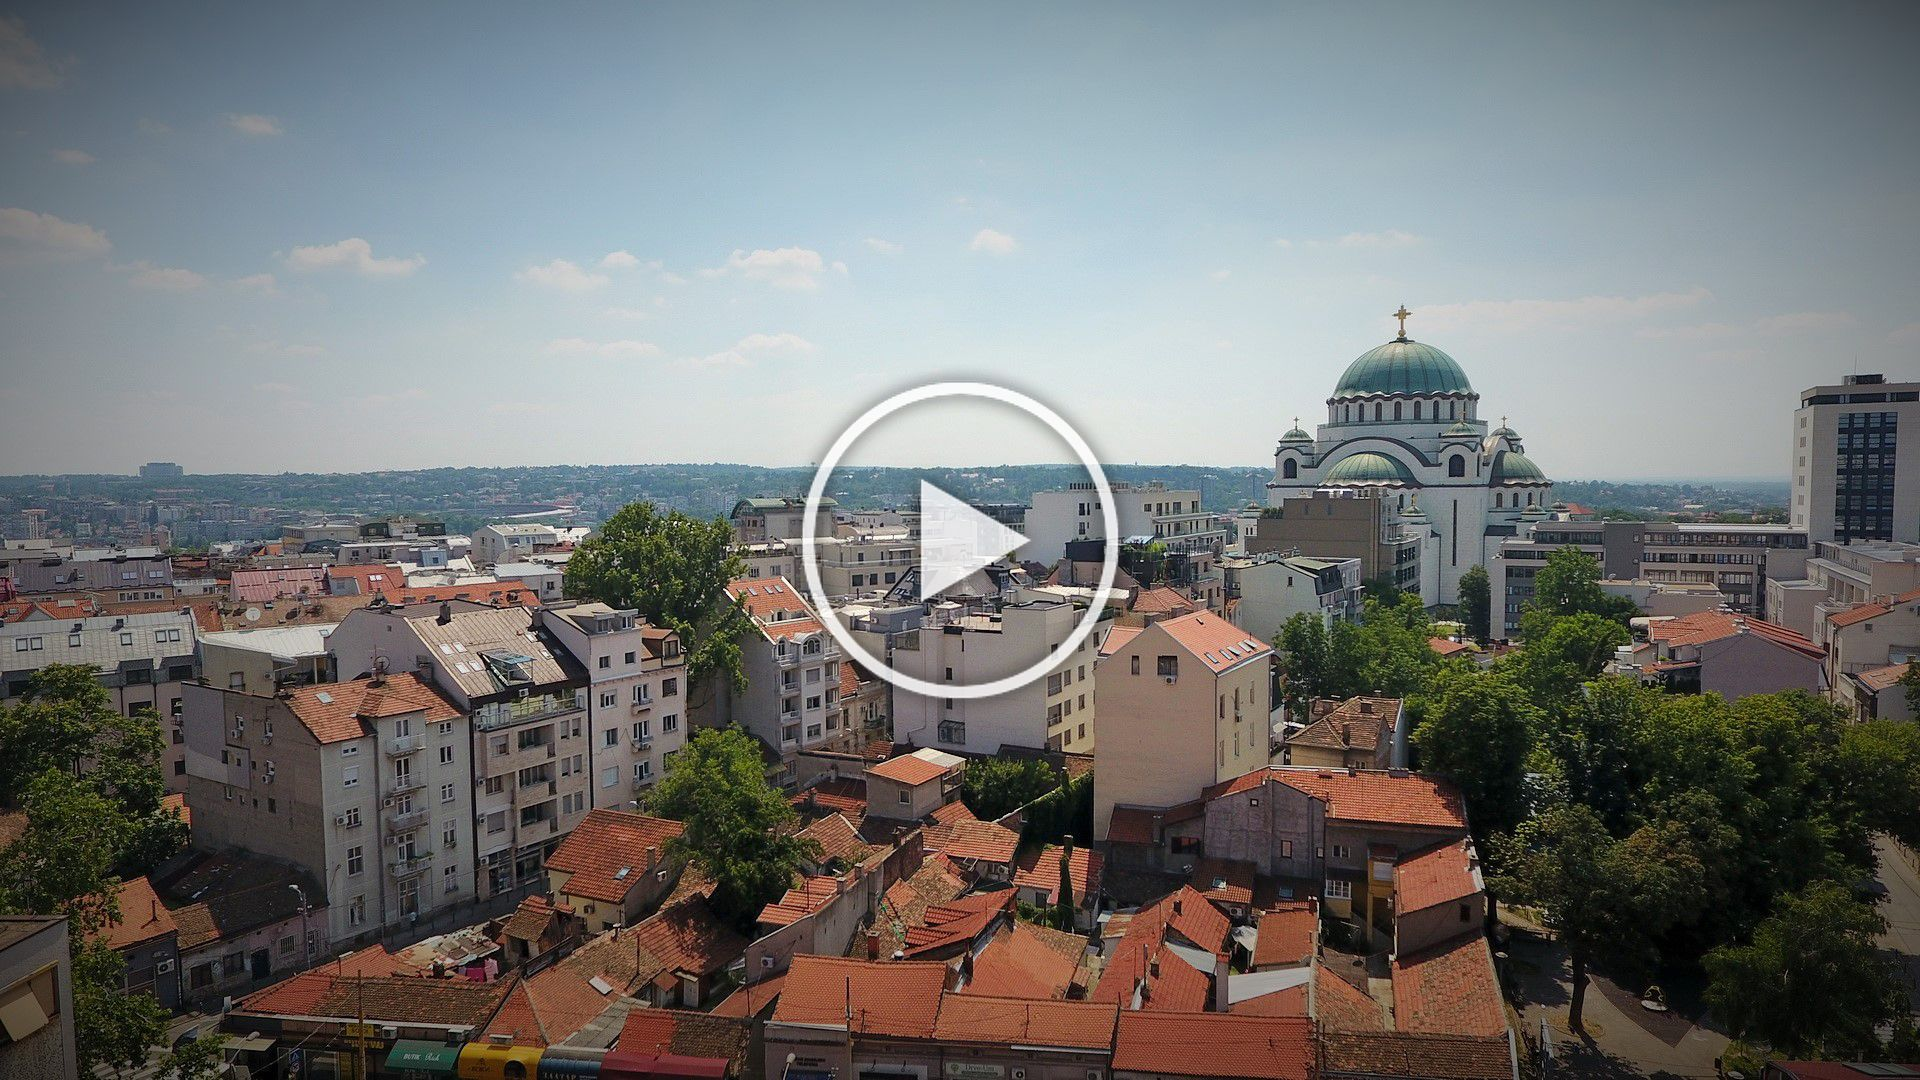 diatreta gallery panoramic environment image in 4k resolution